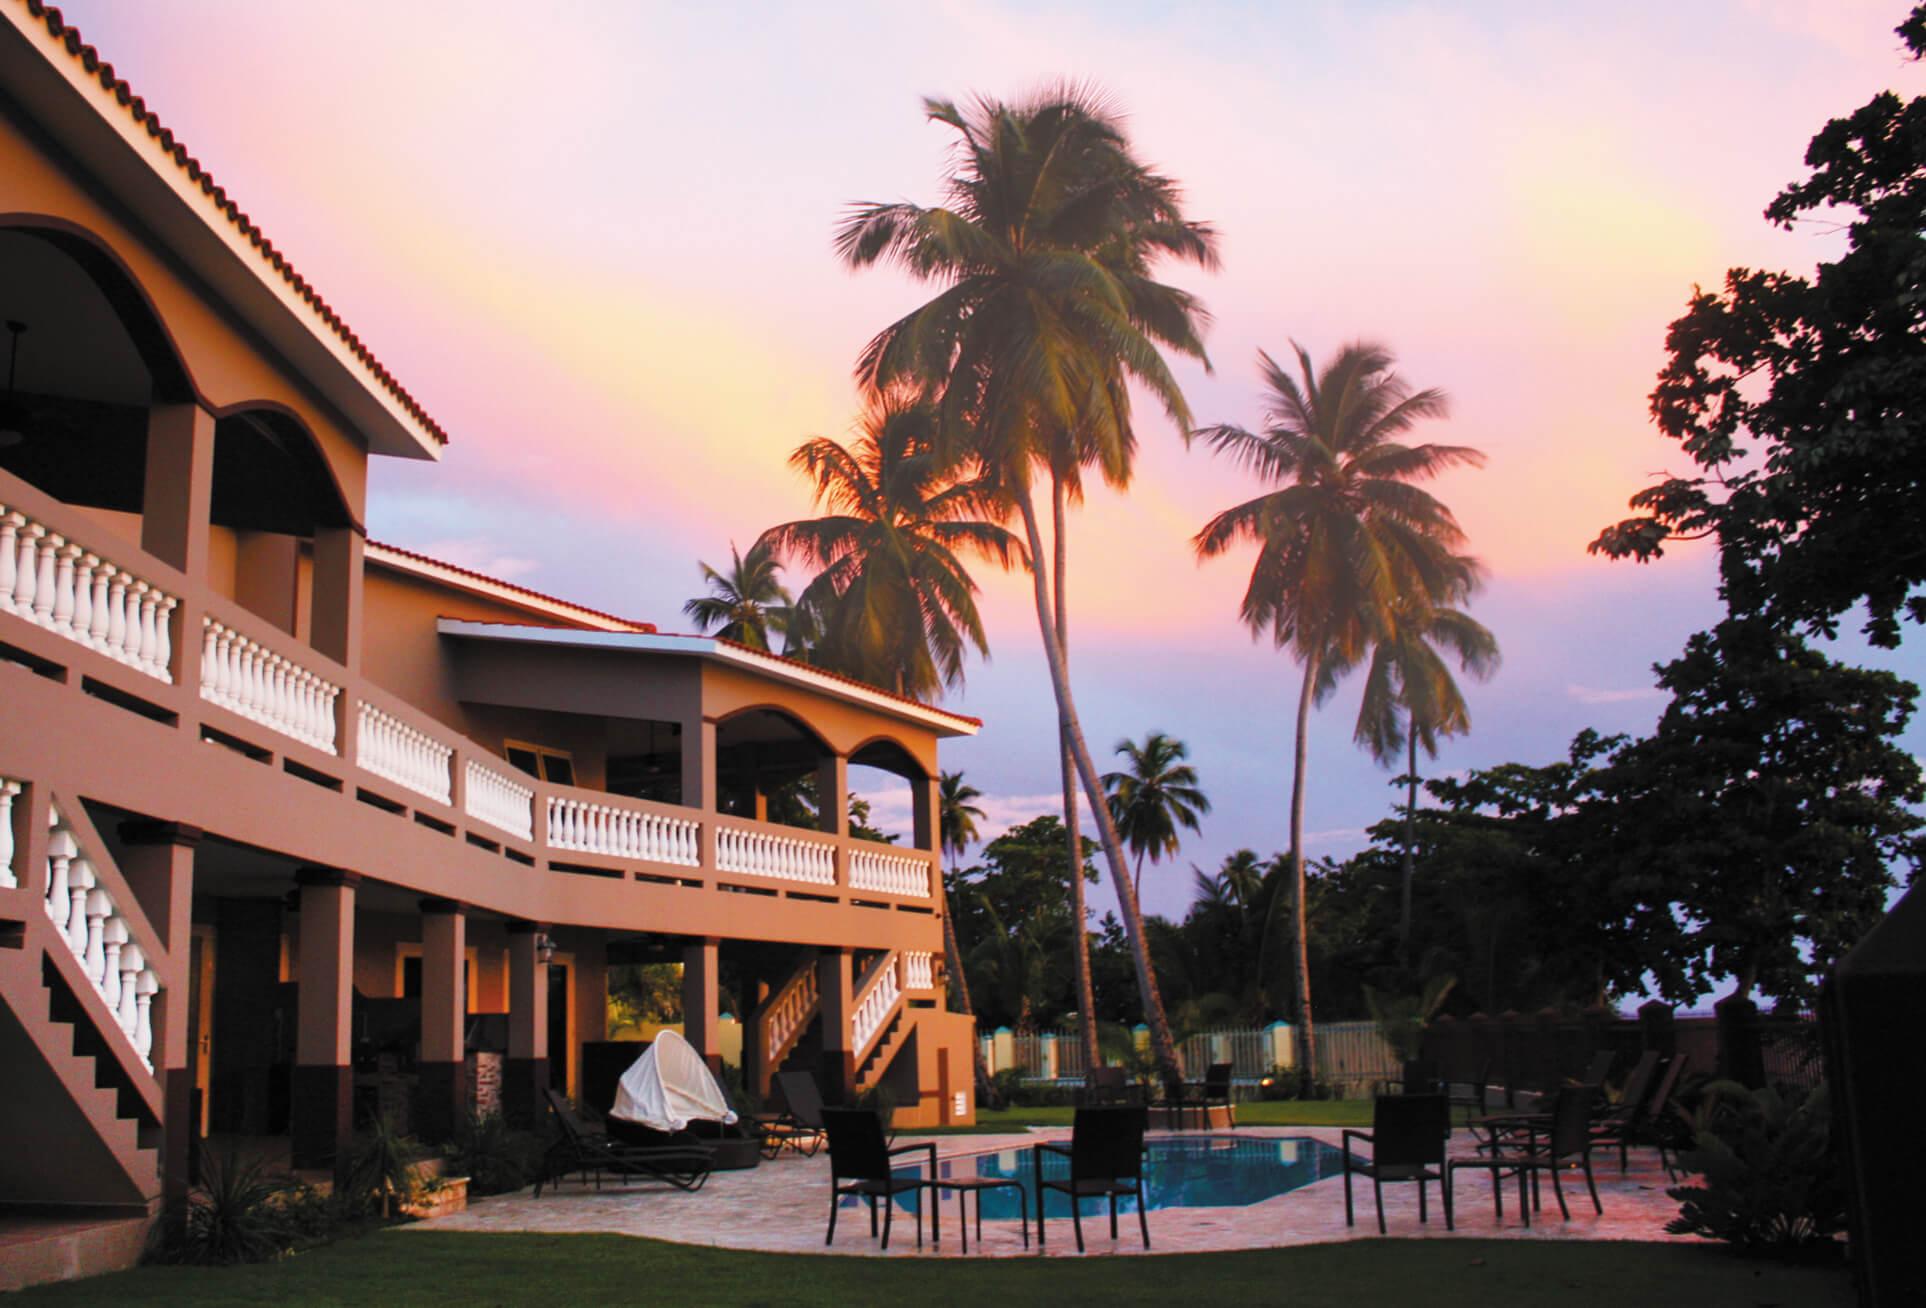 Luxury Rental In Rincón, Puerto Rico